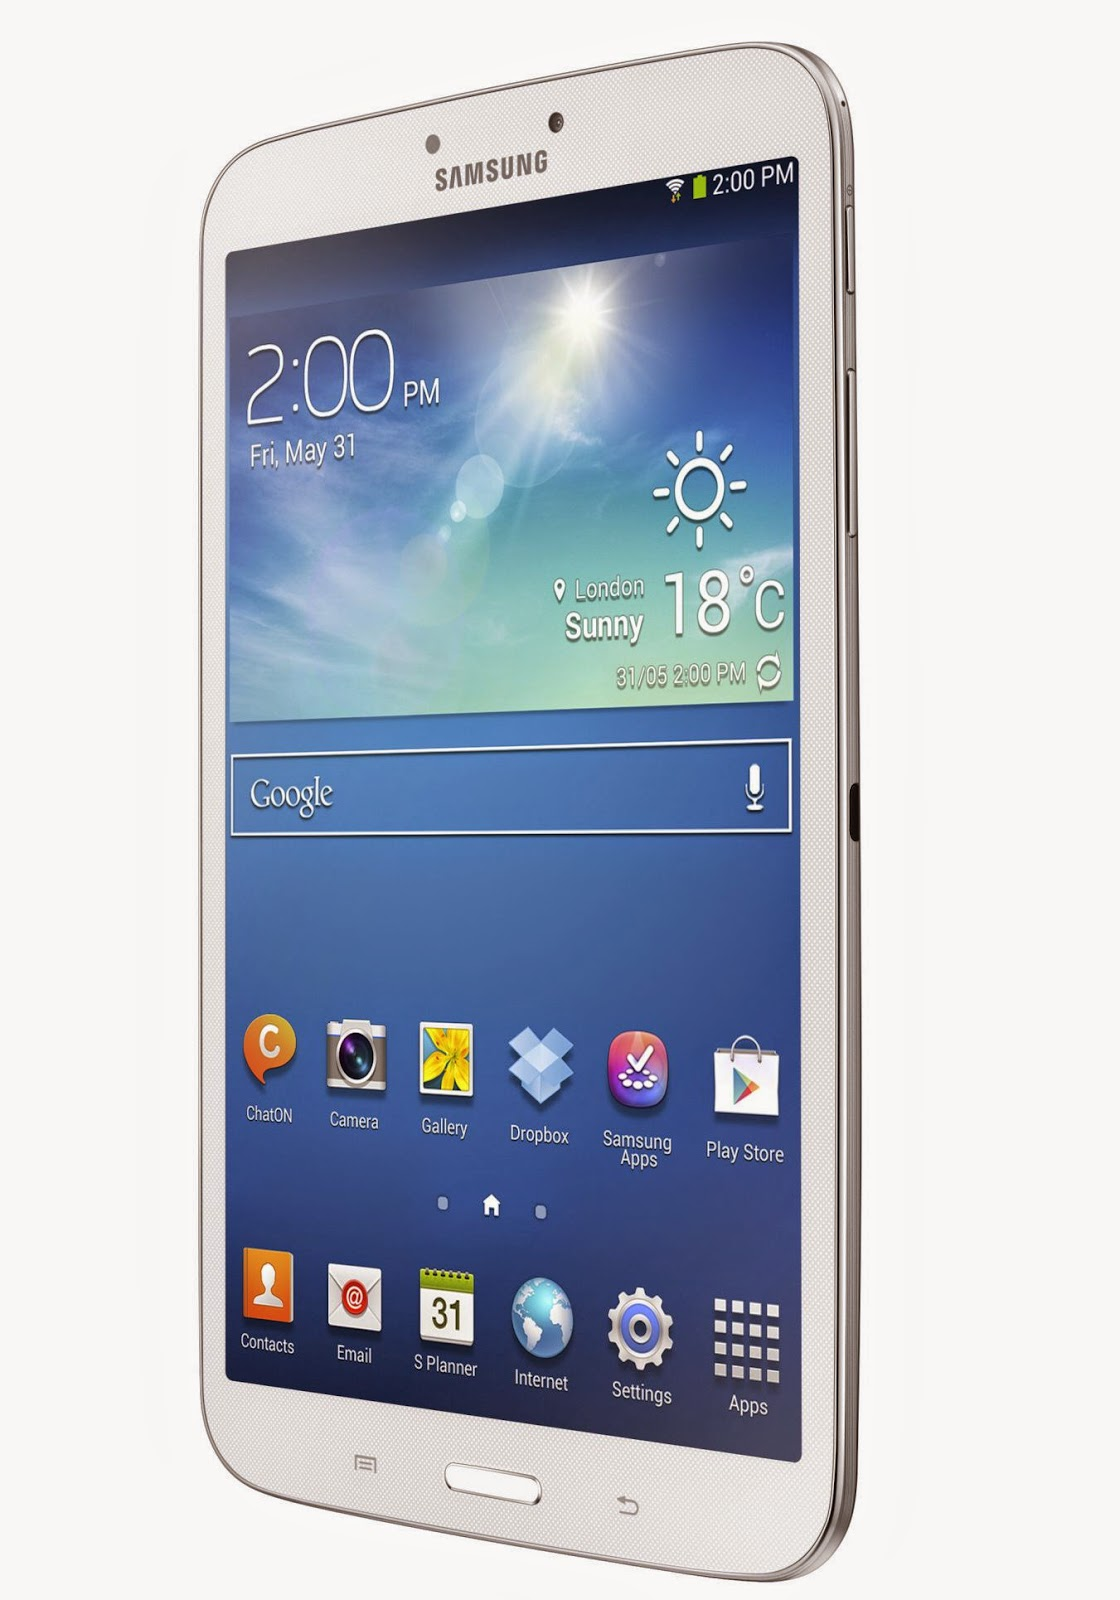 harga Samsung GALAXY Tab 3 8.0, Samsung GALAXY Tab 3 8.0, spesifikasi Samsung GALAXY Tab 3 8.0, Harga Tablet Samsung,